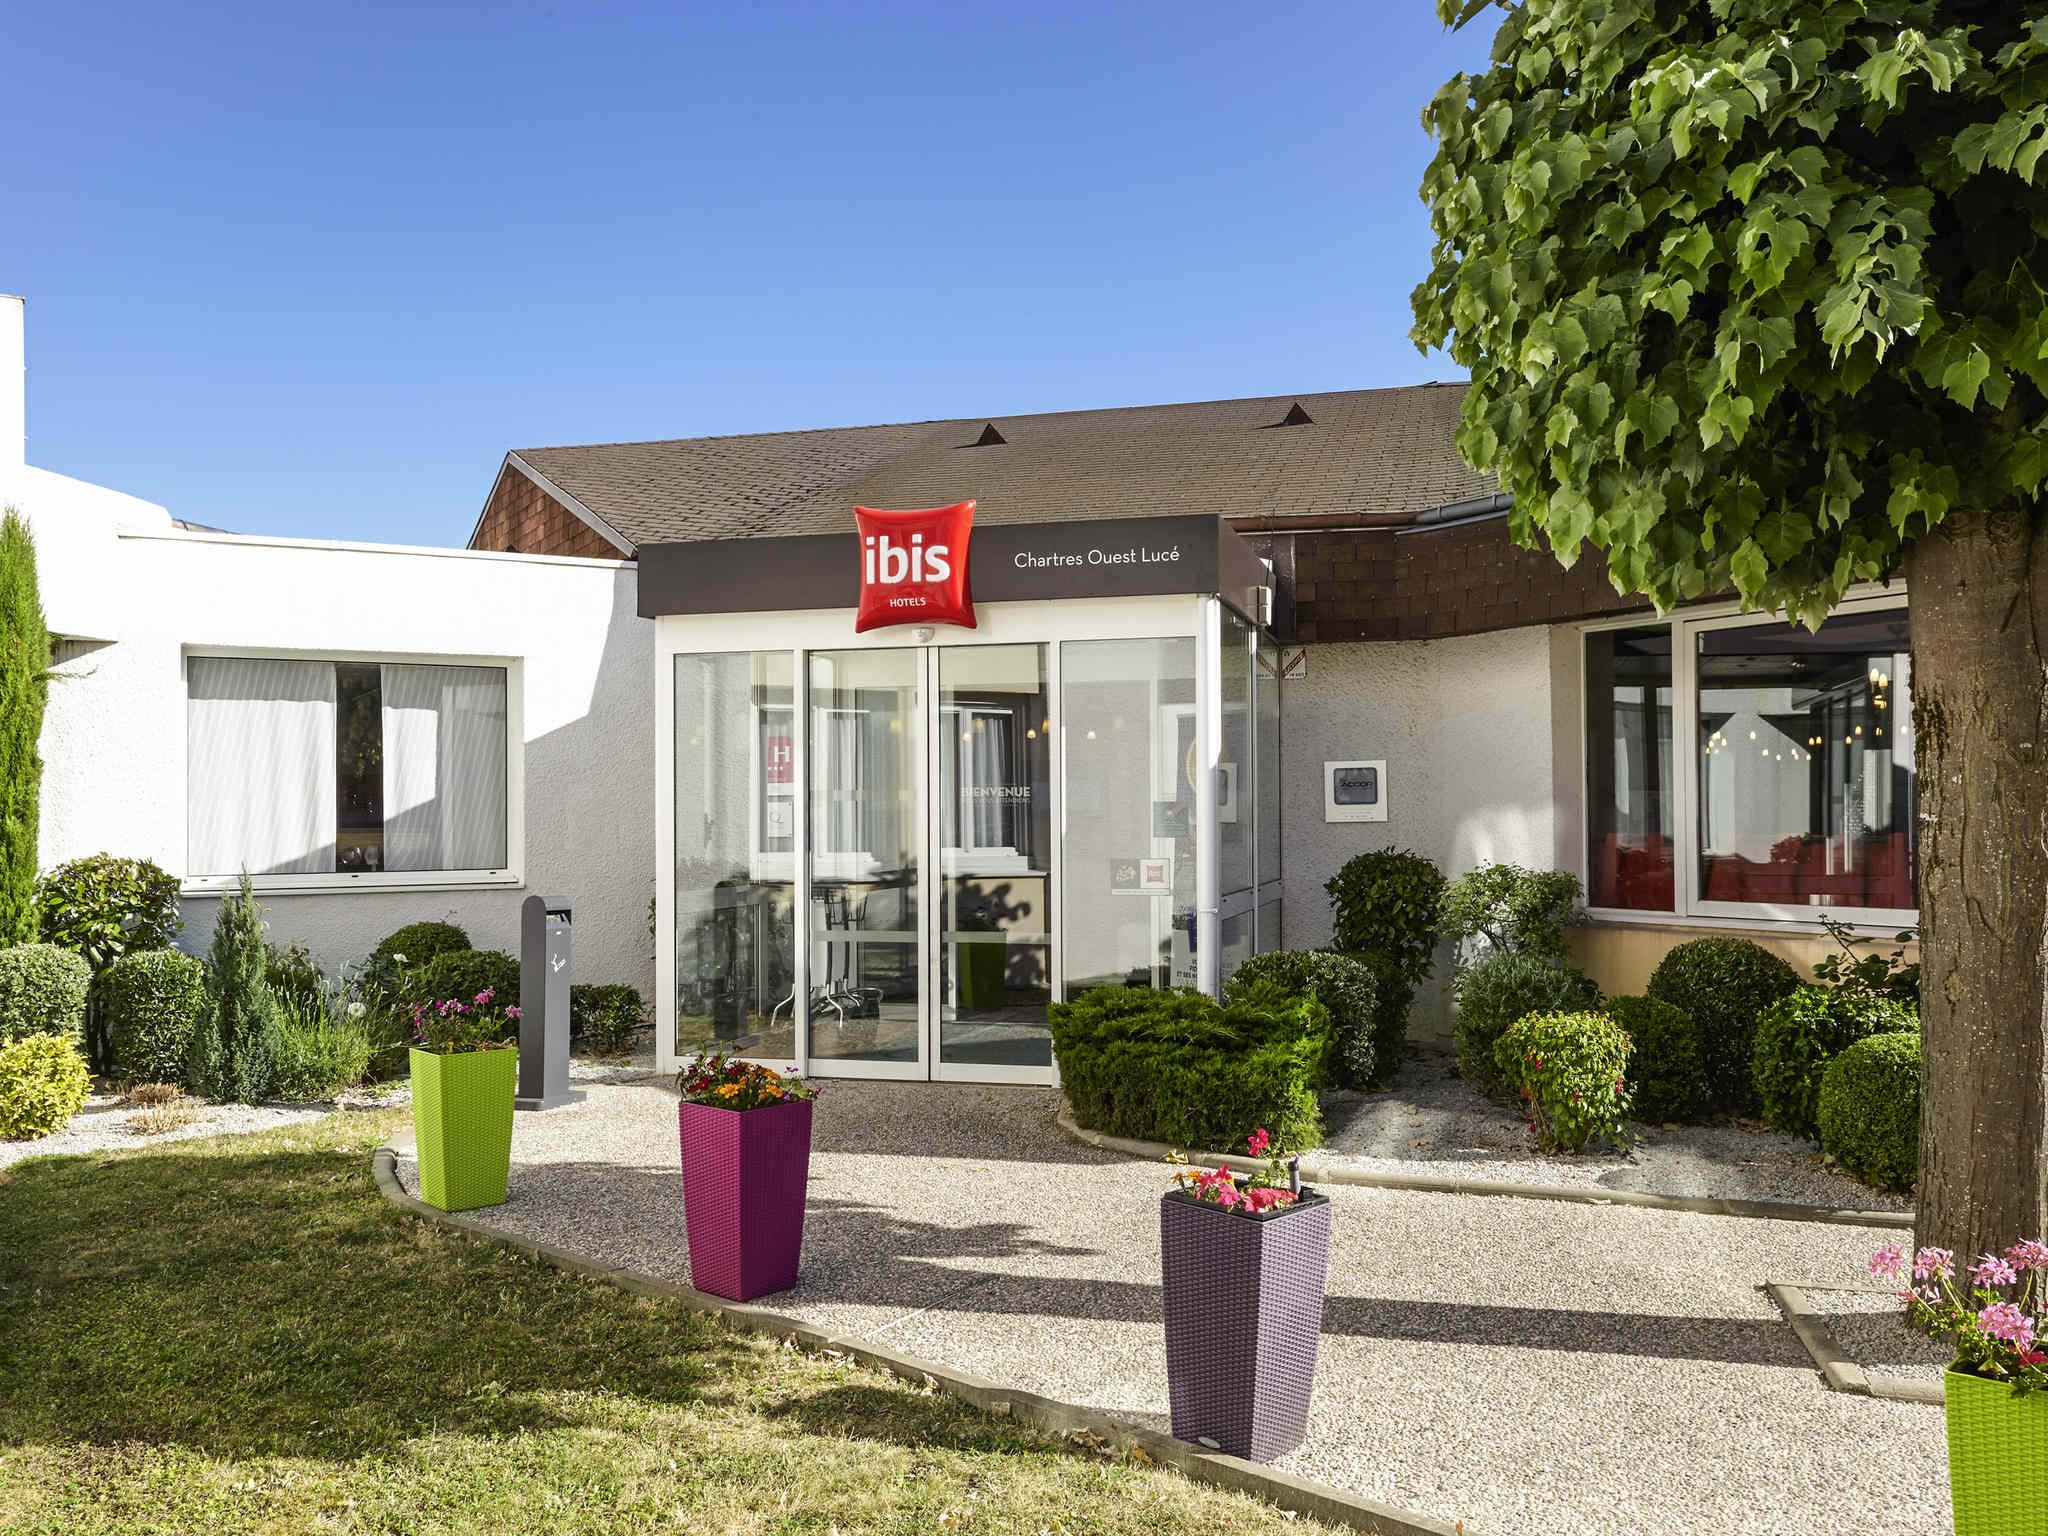 酒店 – ibis Chartres Ouest Luce